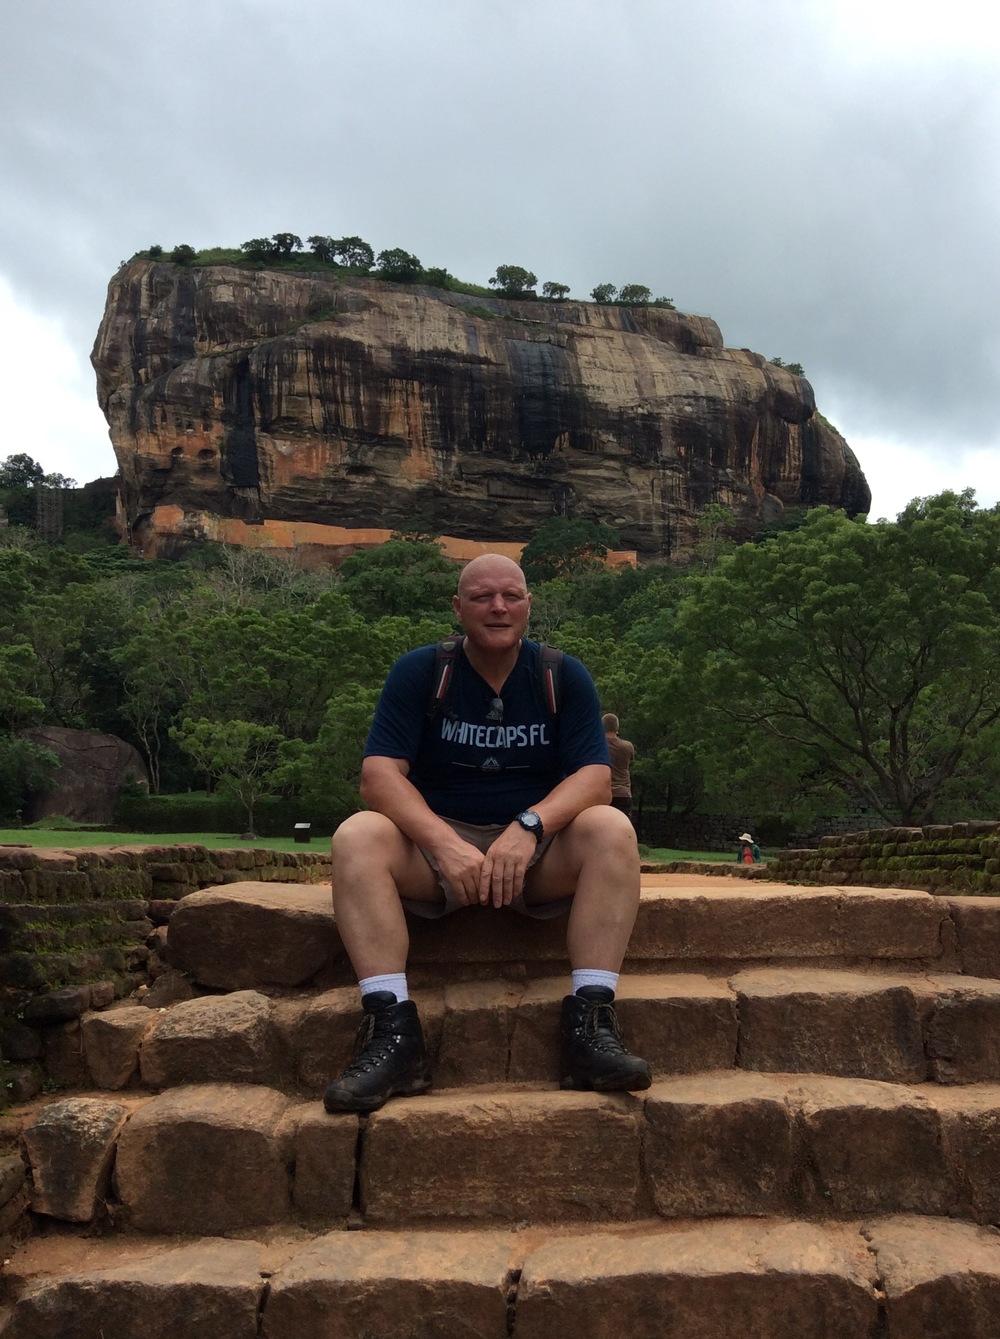 Scott on location in Sri Lanka